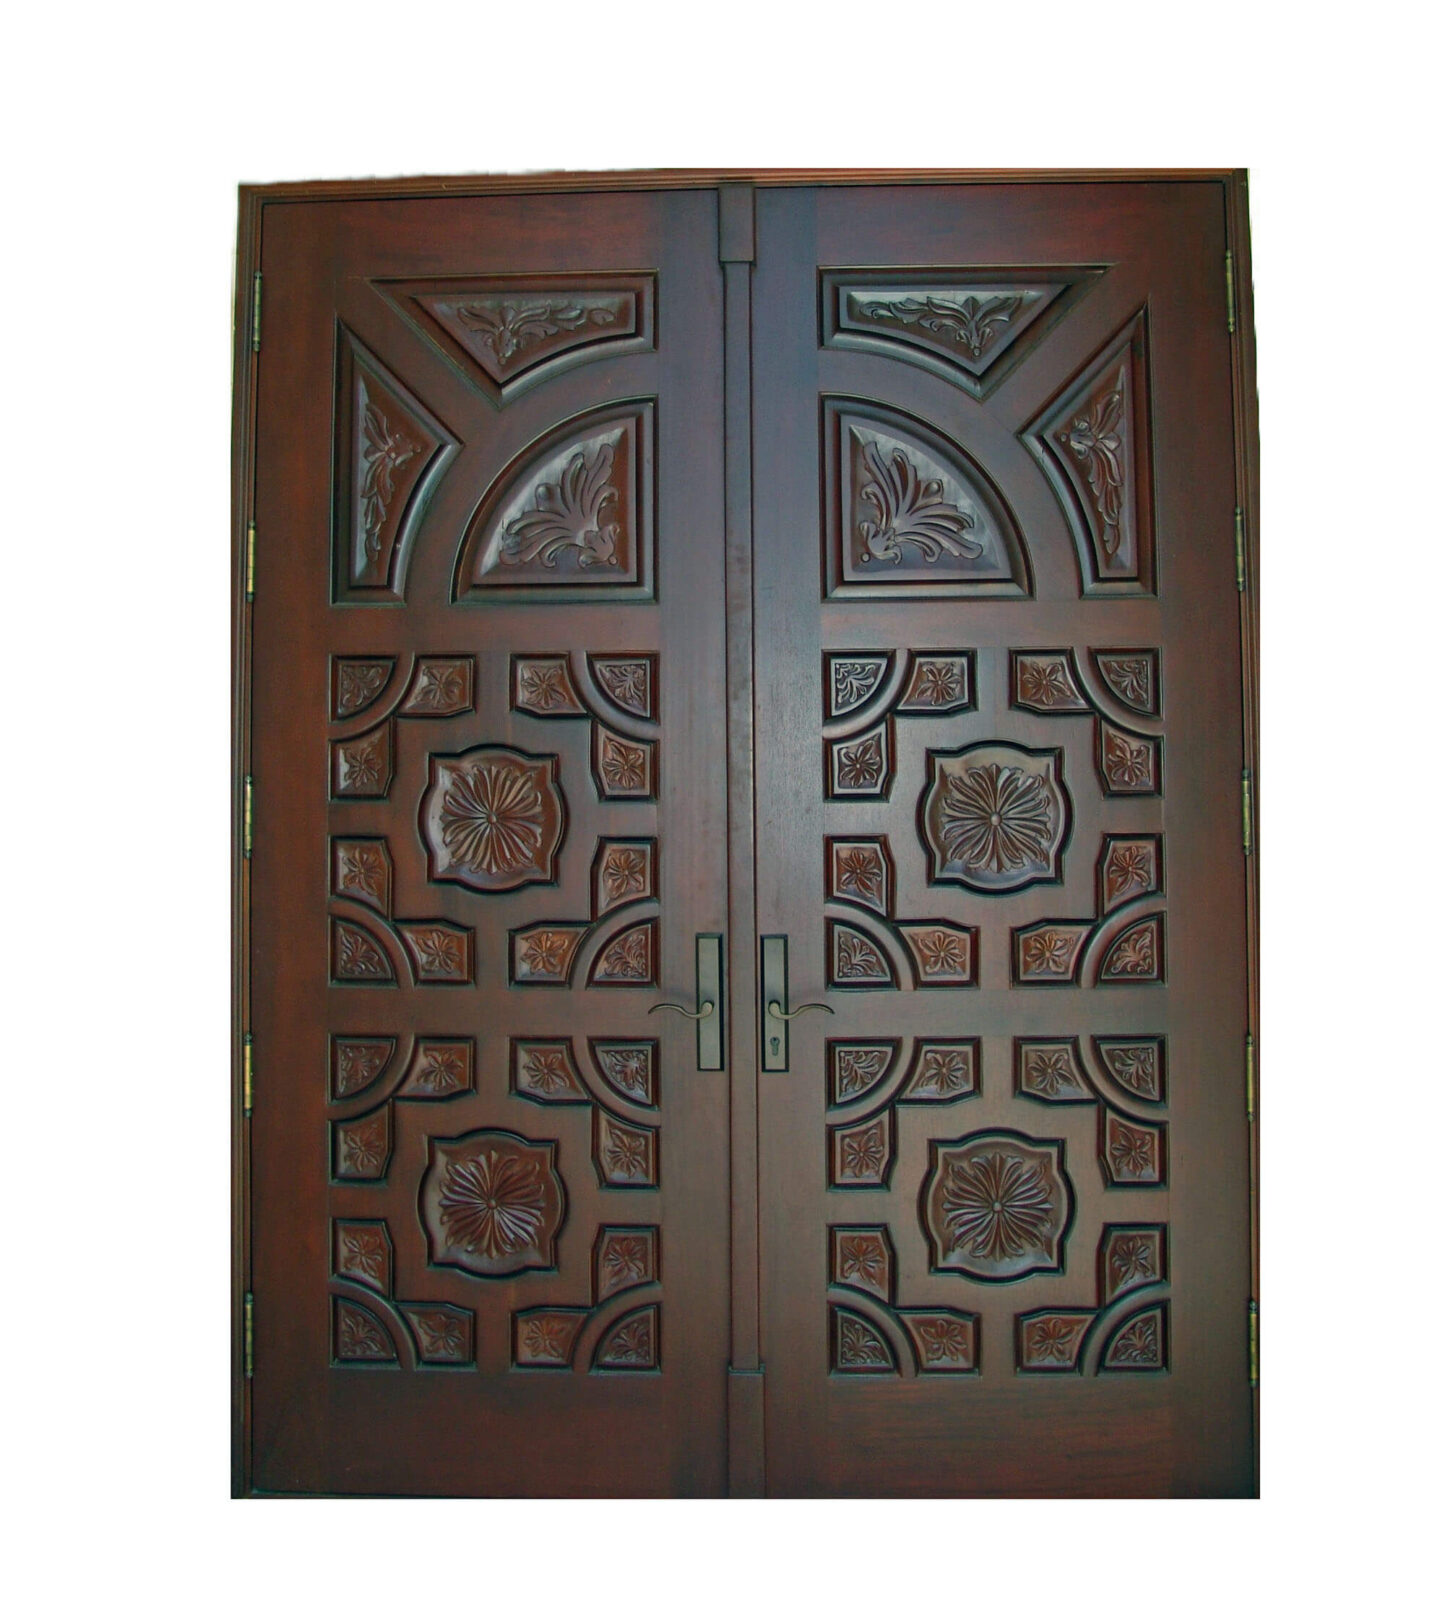 CAPE CORAL. MAHOGANY CARVED DOOR.